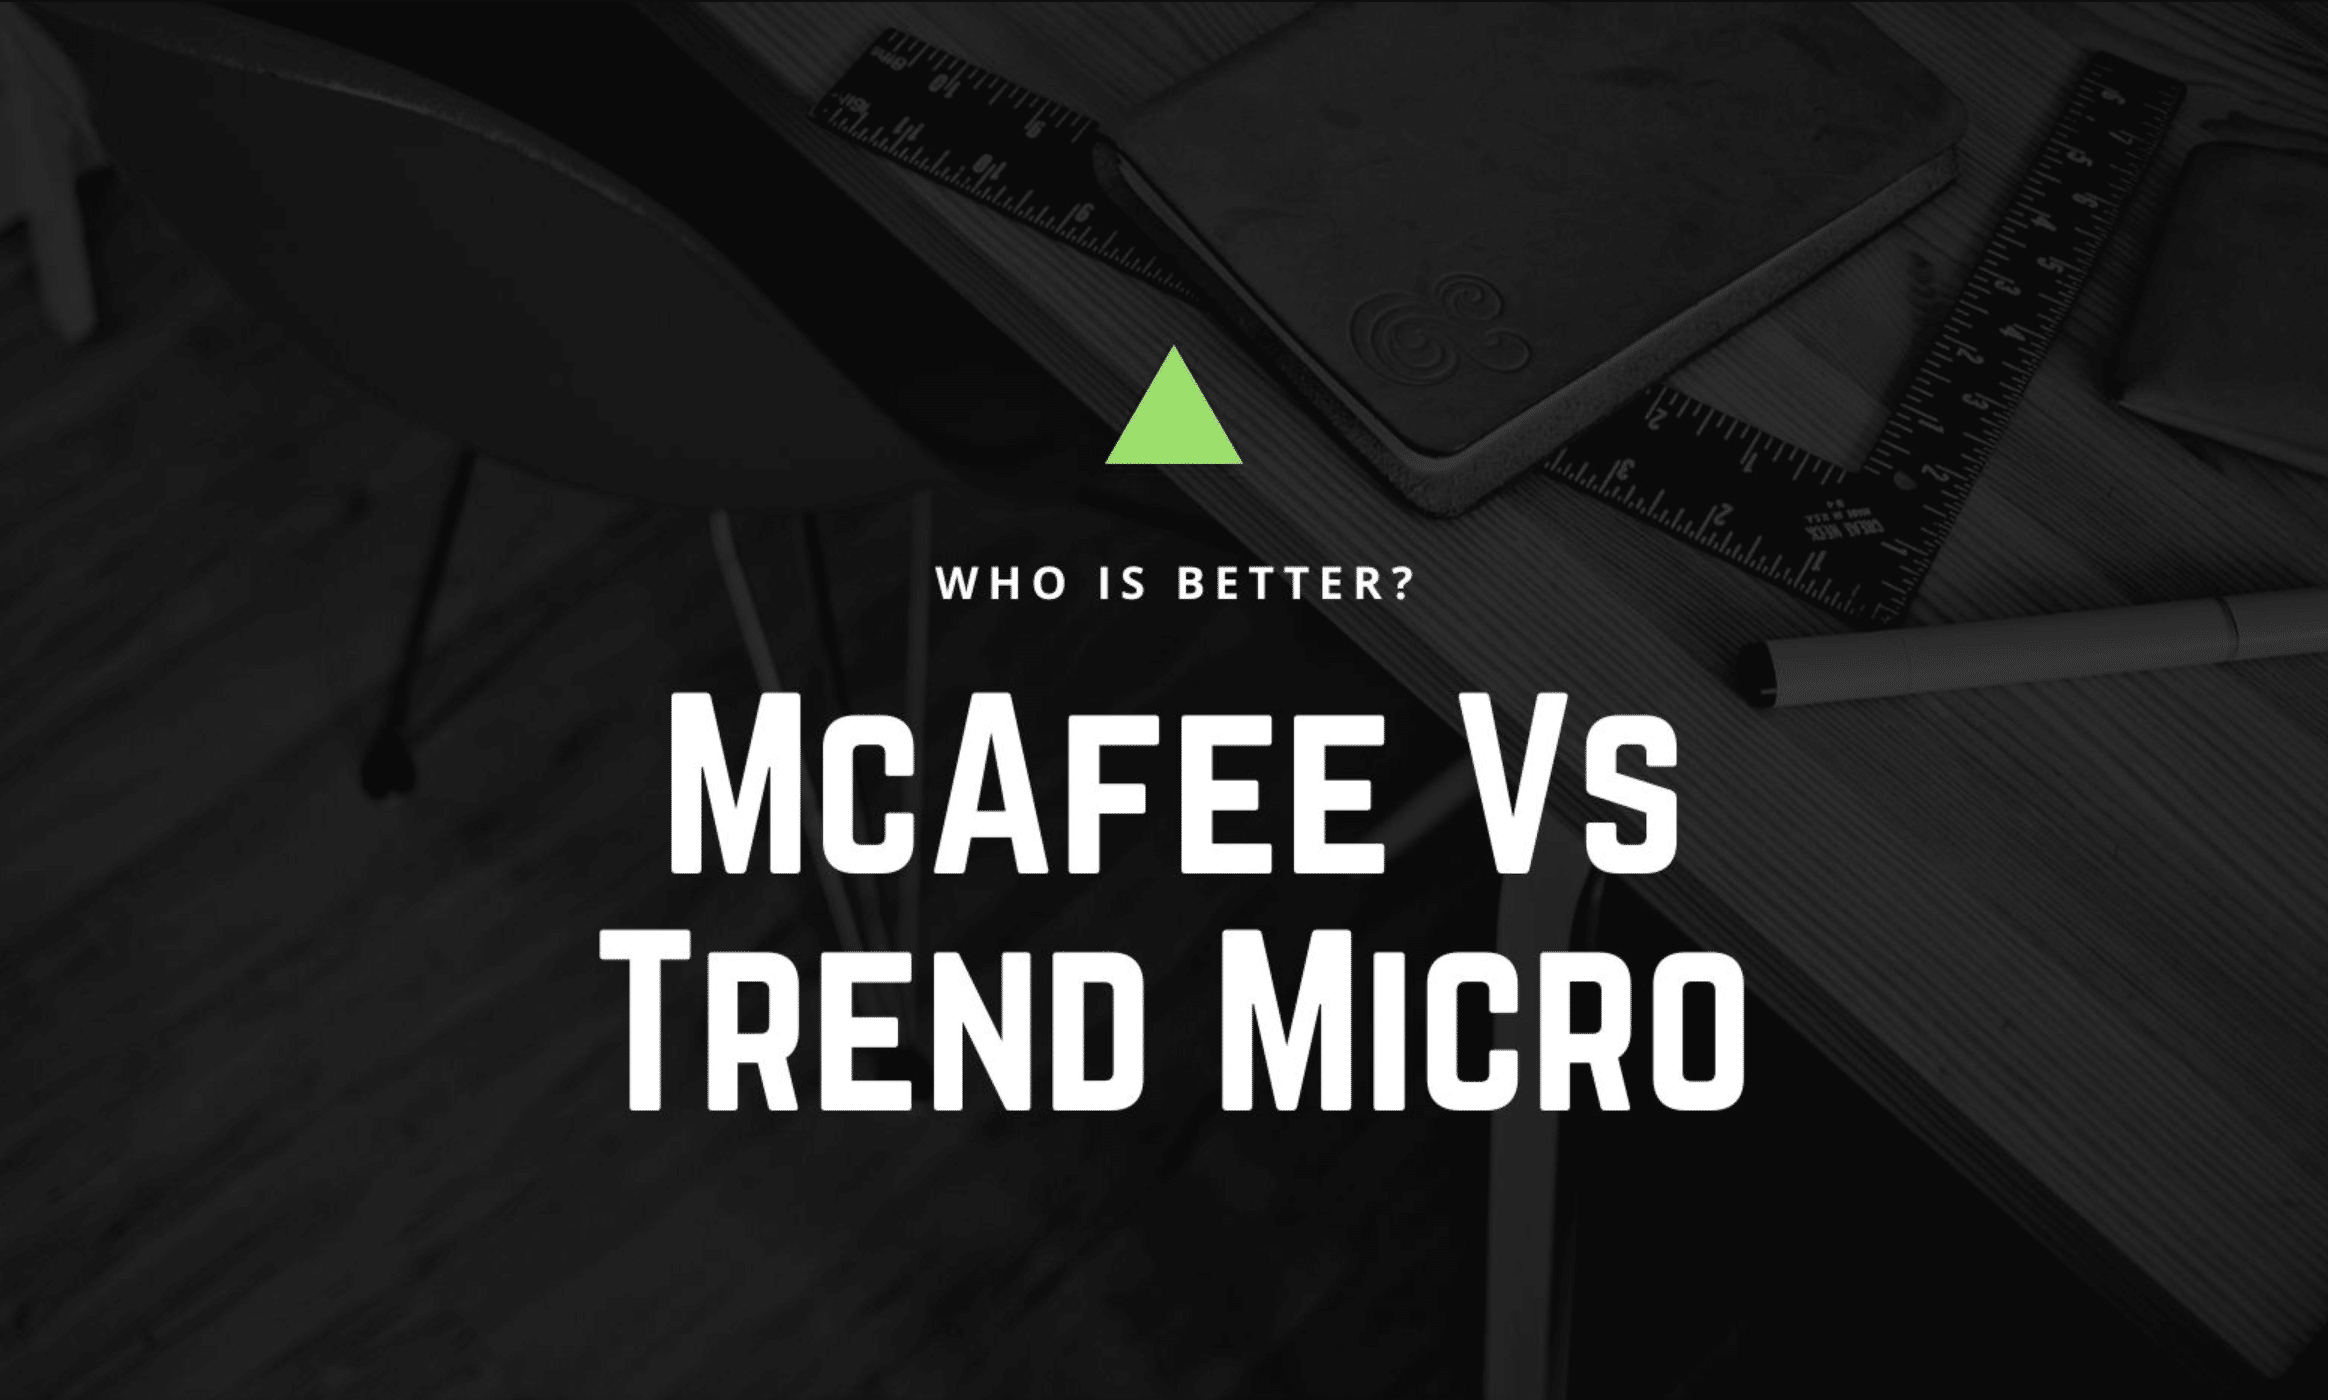 mcafee vs trend micro